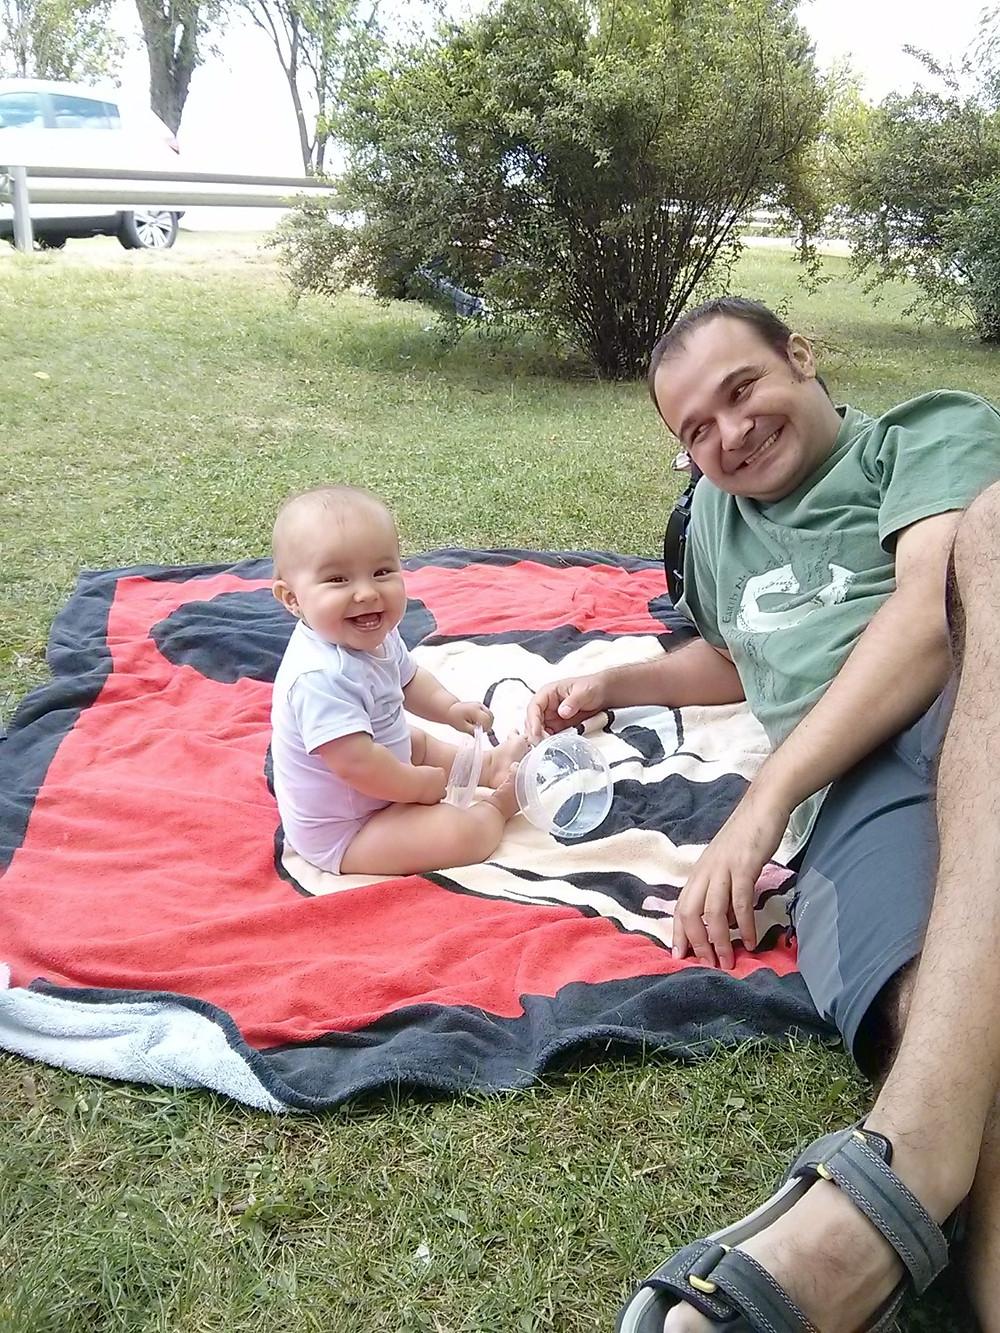 consells alimentacio viatjar nadons consejos alimentacion viajar bebes 02